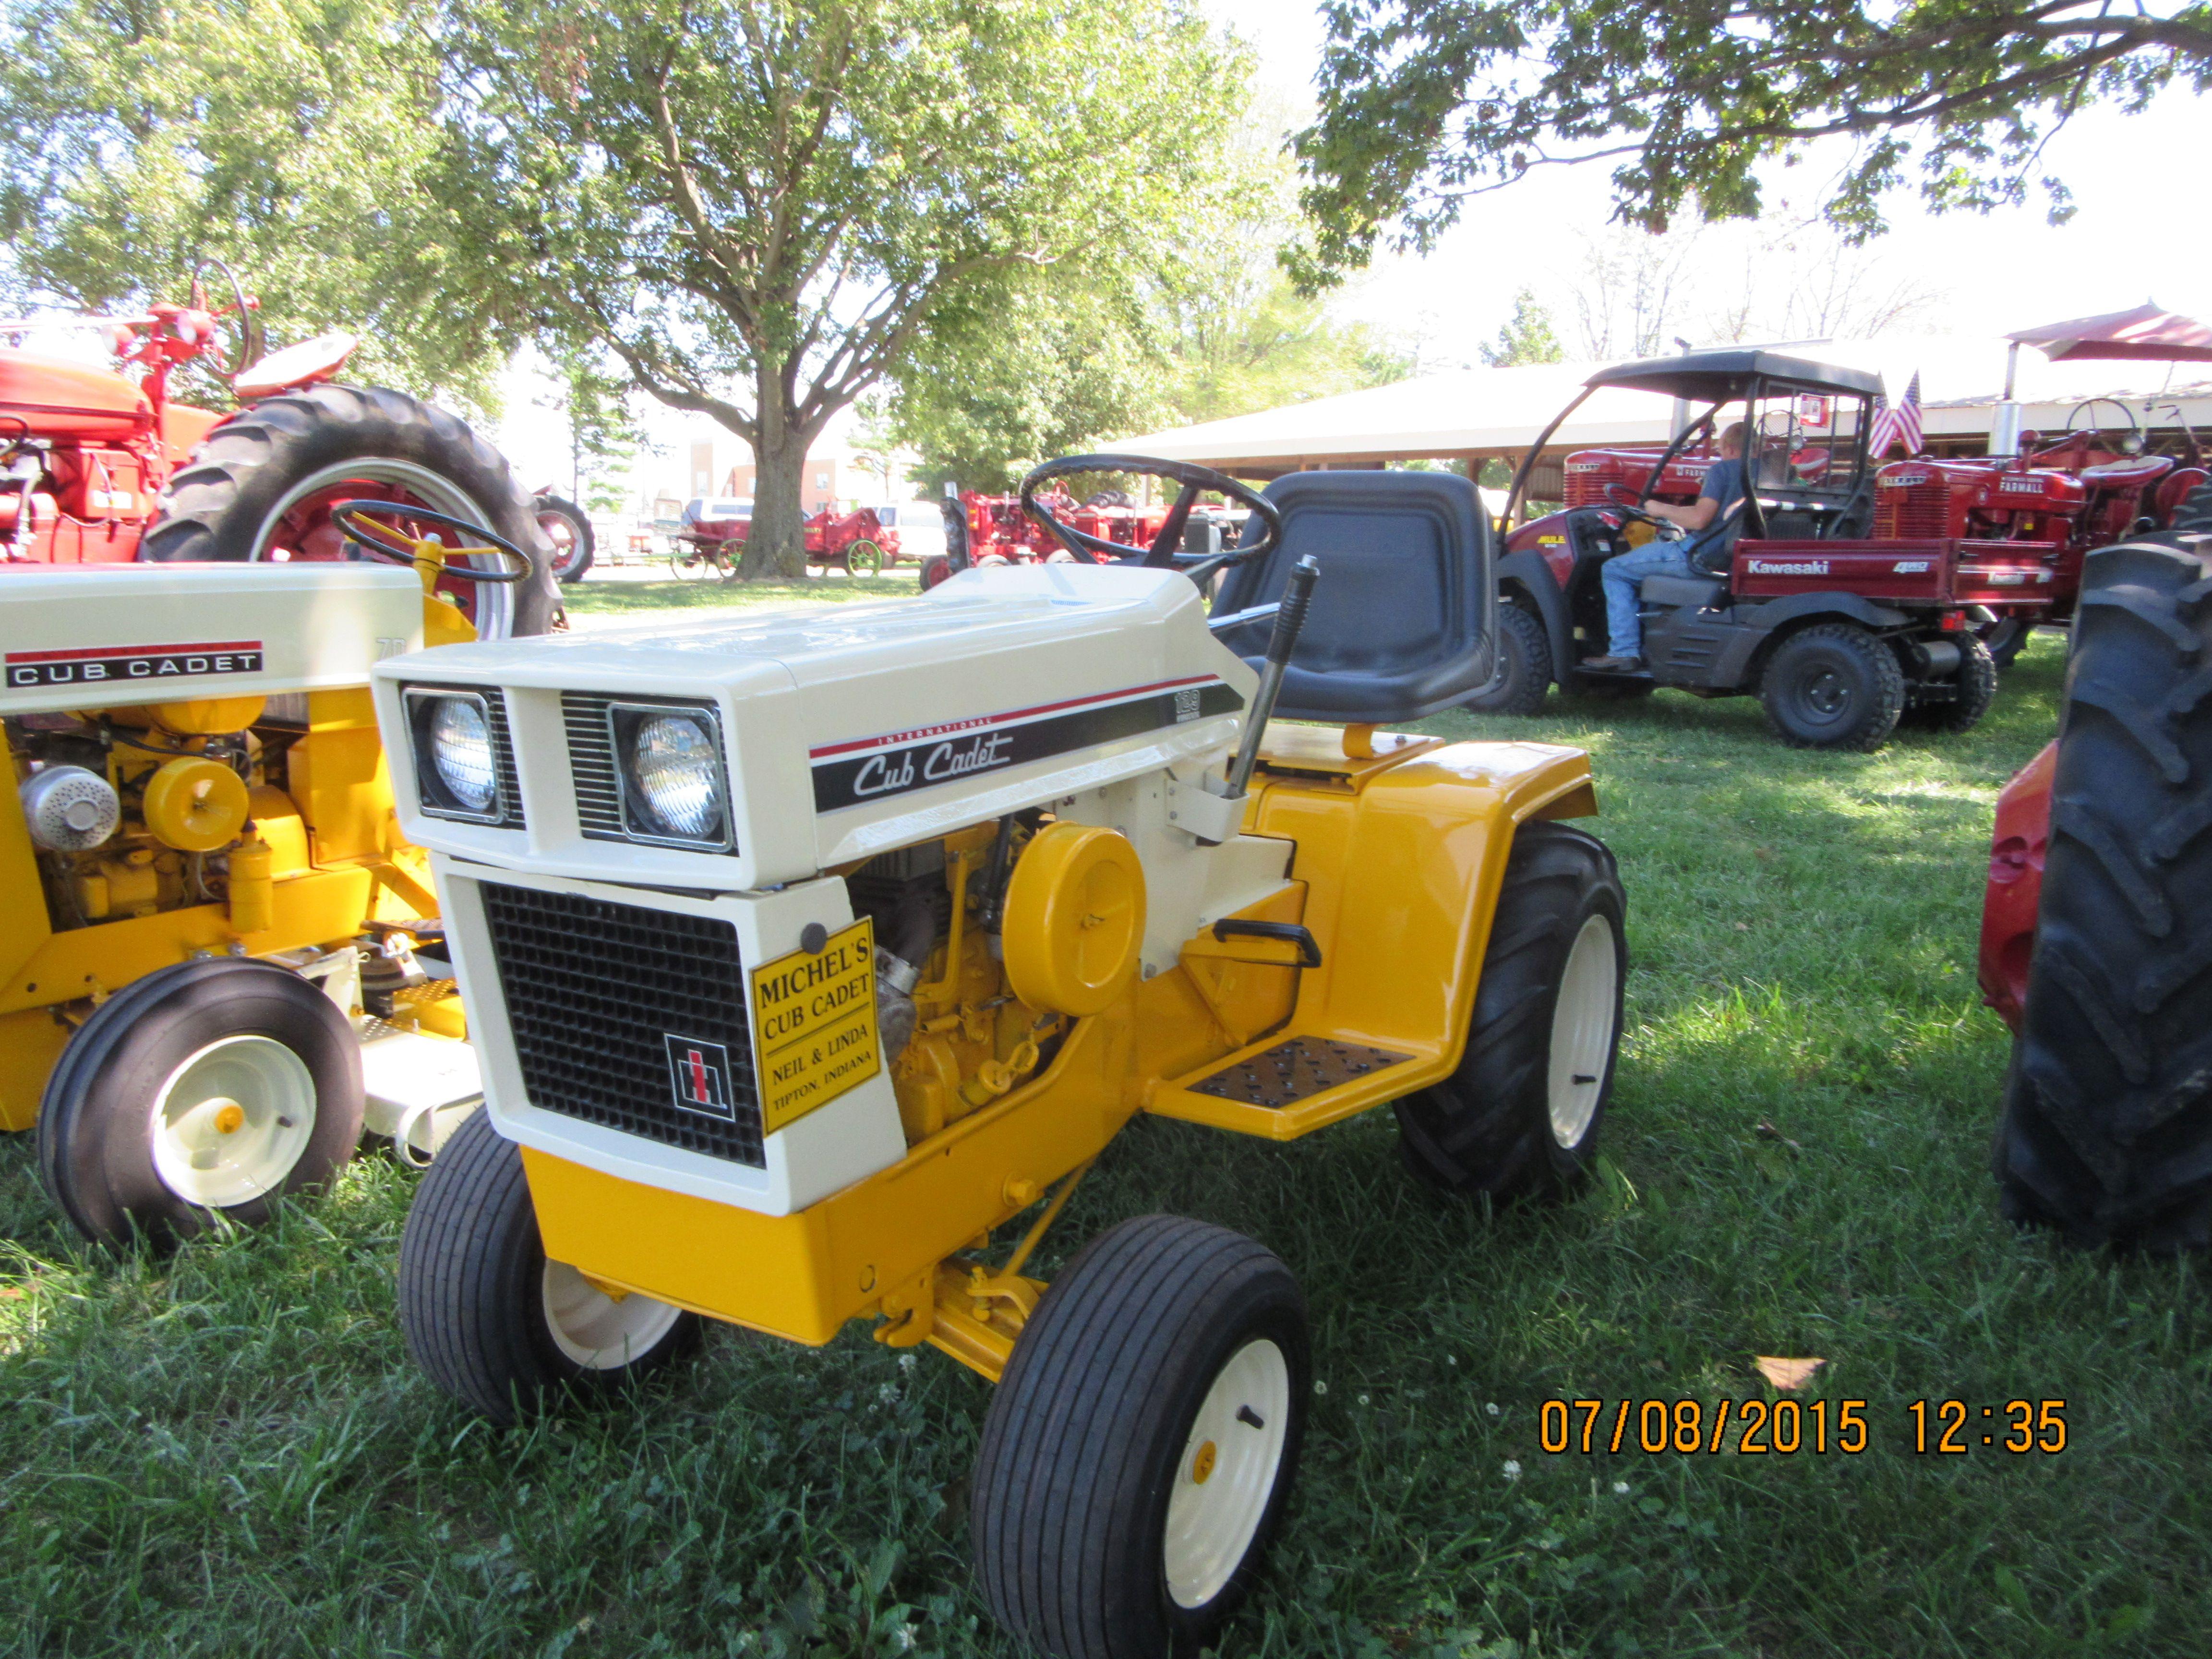 international cub cadet 129 hydro garden tractor [ 4608 x 3456 Pixel ]